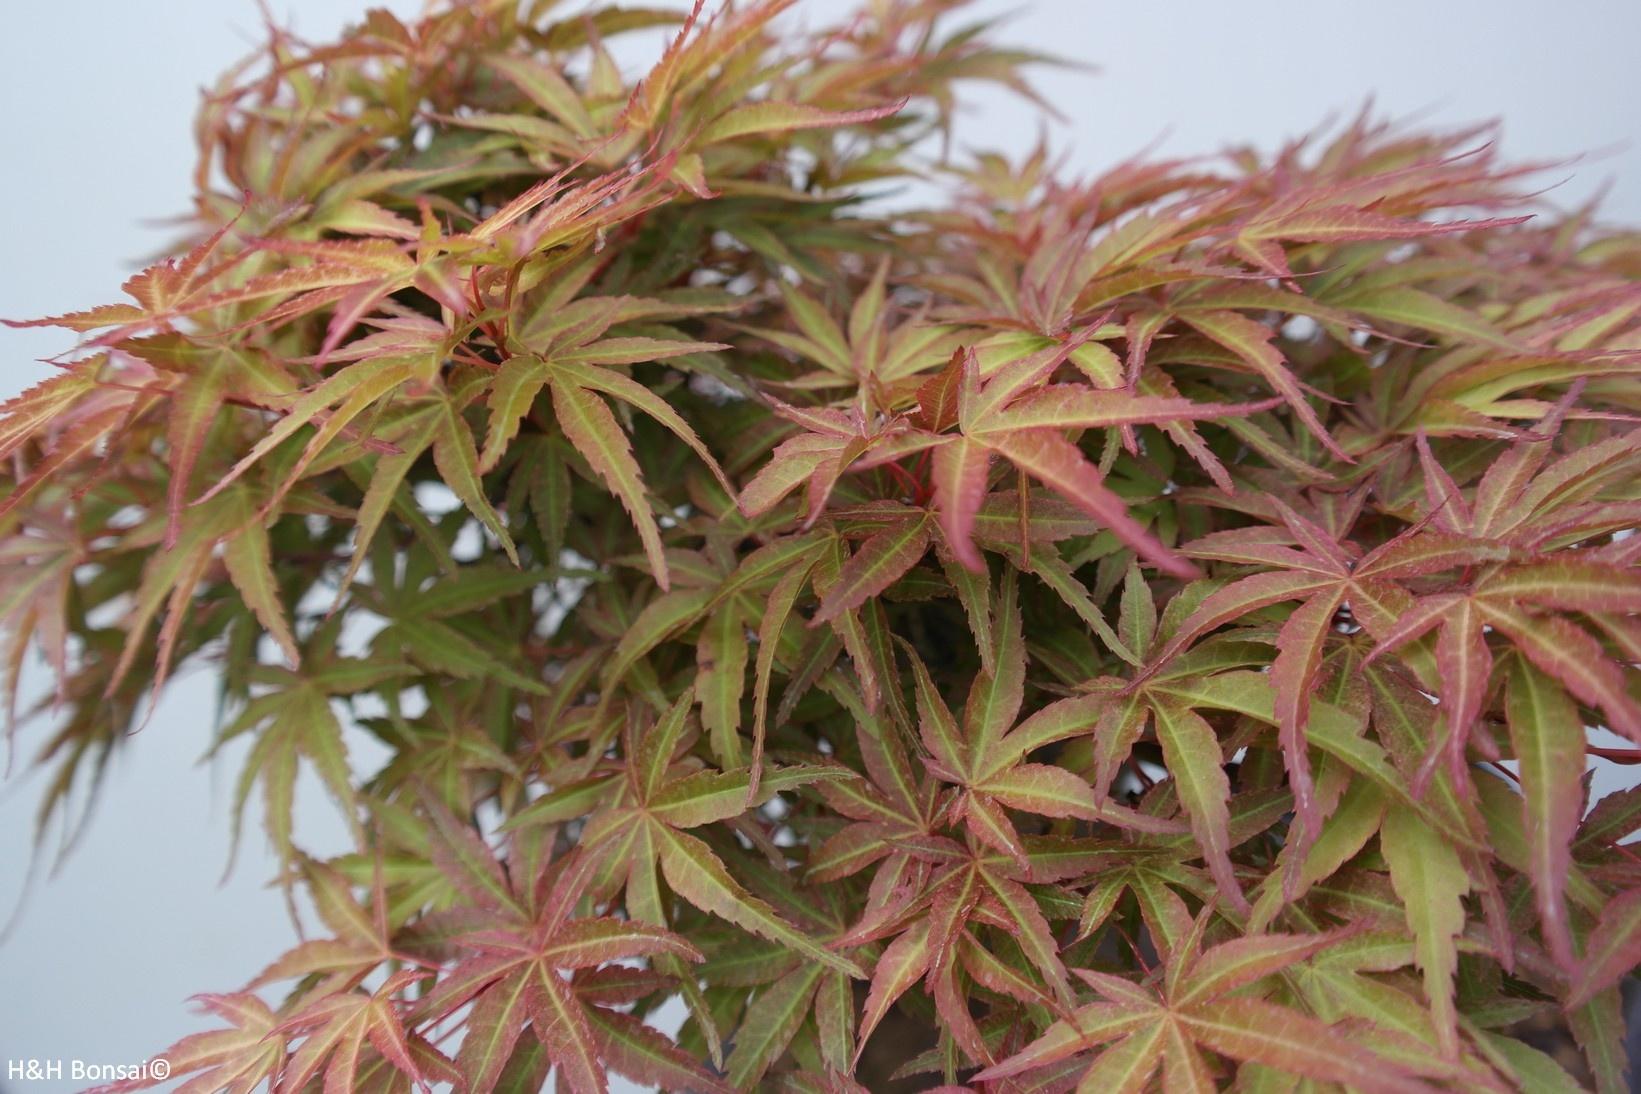 Bonsai Acer palmatum, Japanse esdoorn, nr. 7767